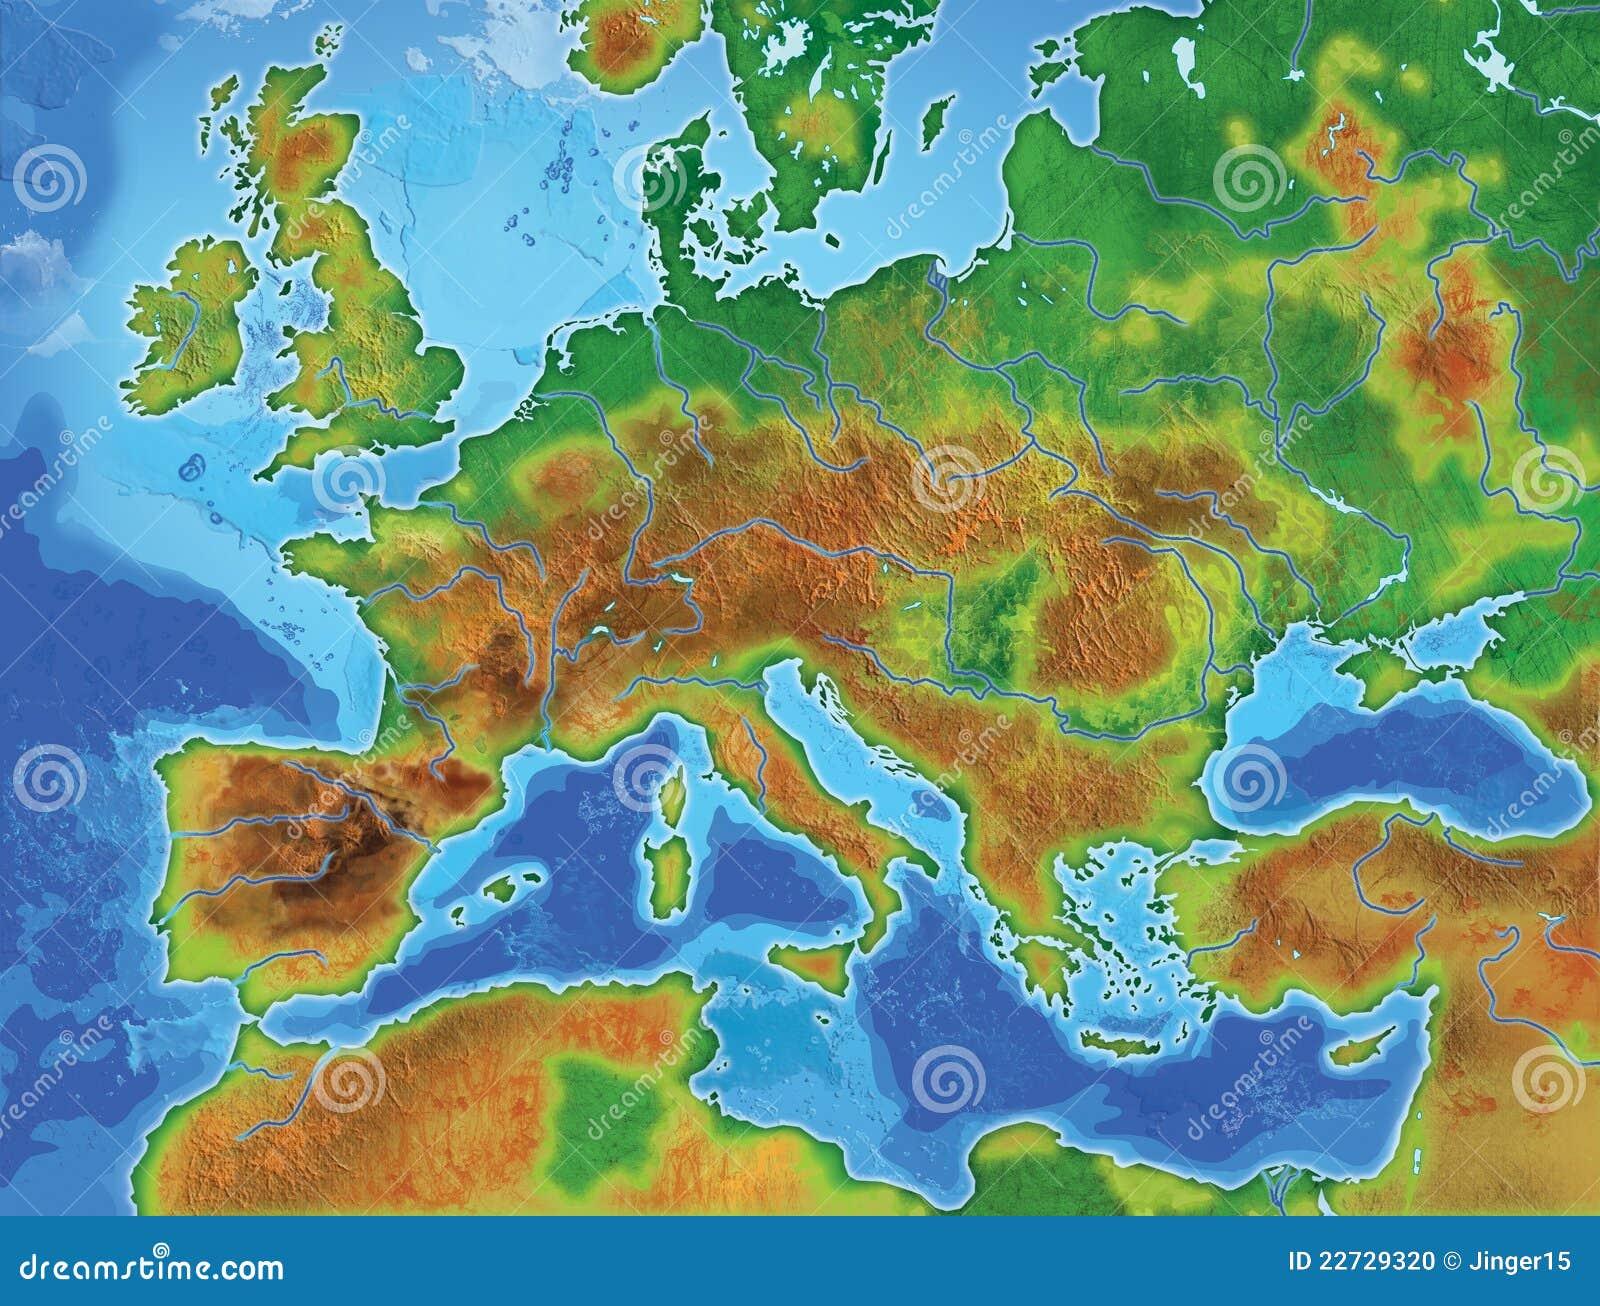 Europa Karte Stock Abbildung Illustration Von Insel 22729320